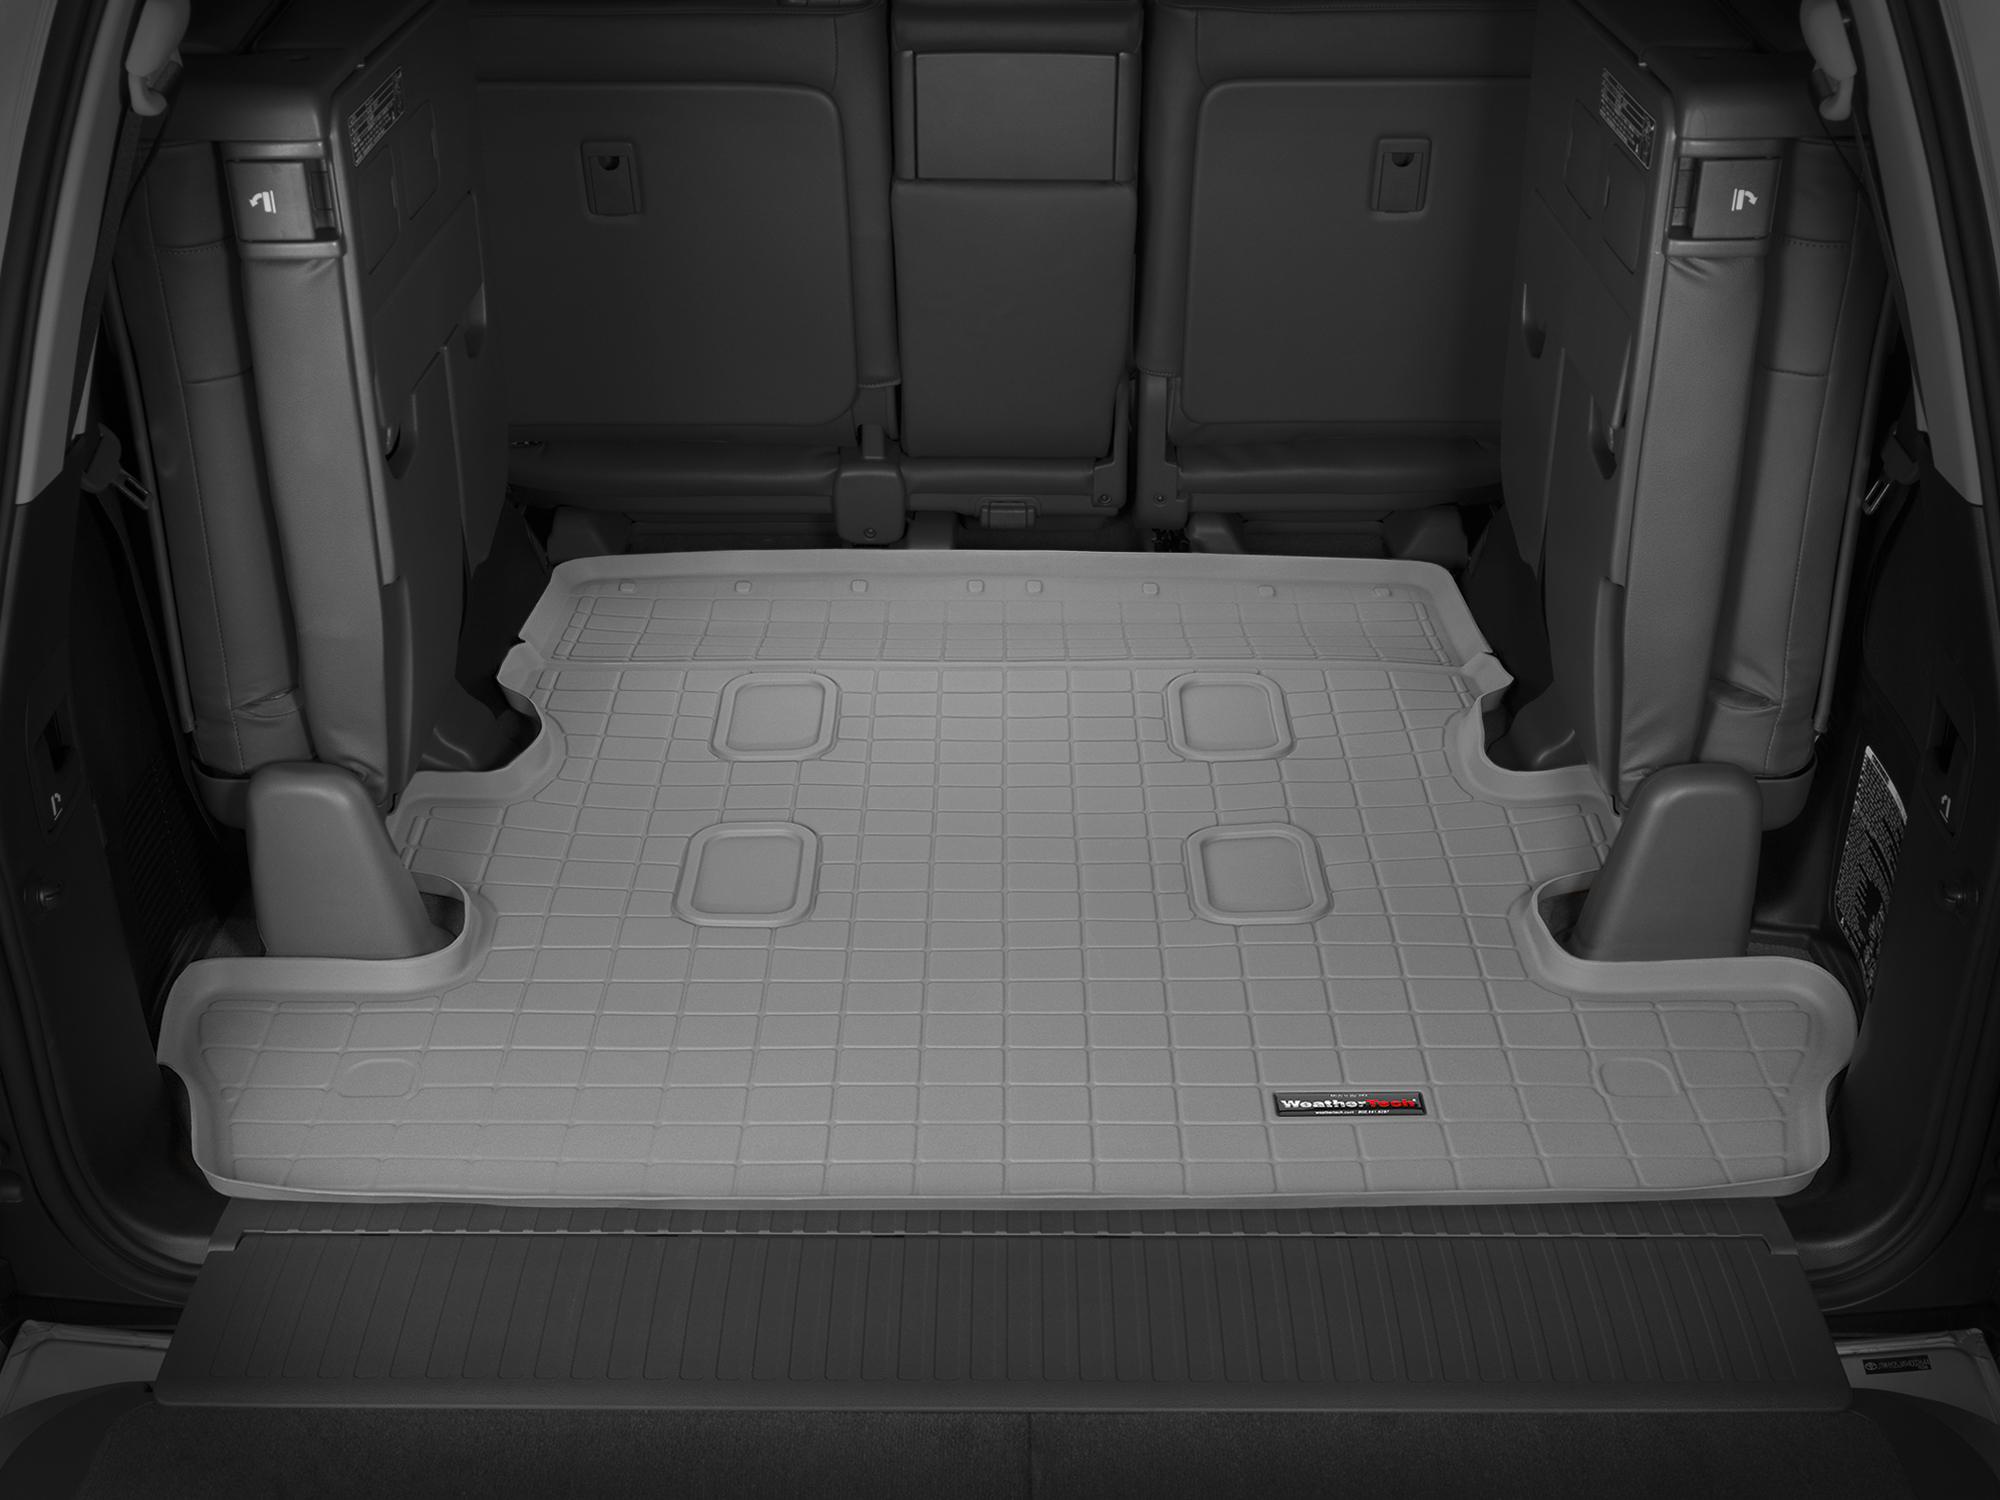 Toyota Land Cruiser V8 2008>2017 Vasca baule tappeto bagagliaio grigio *1248